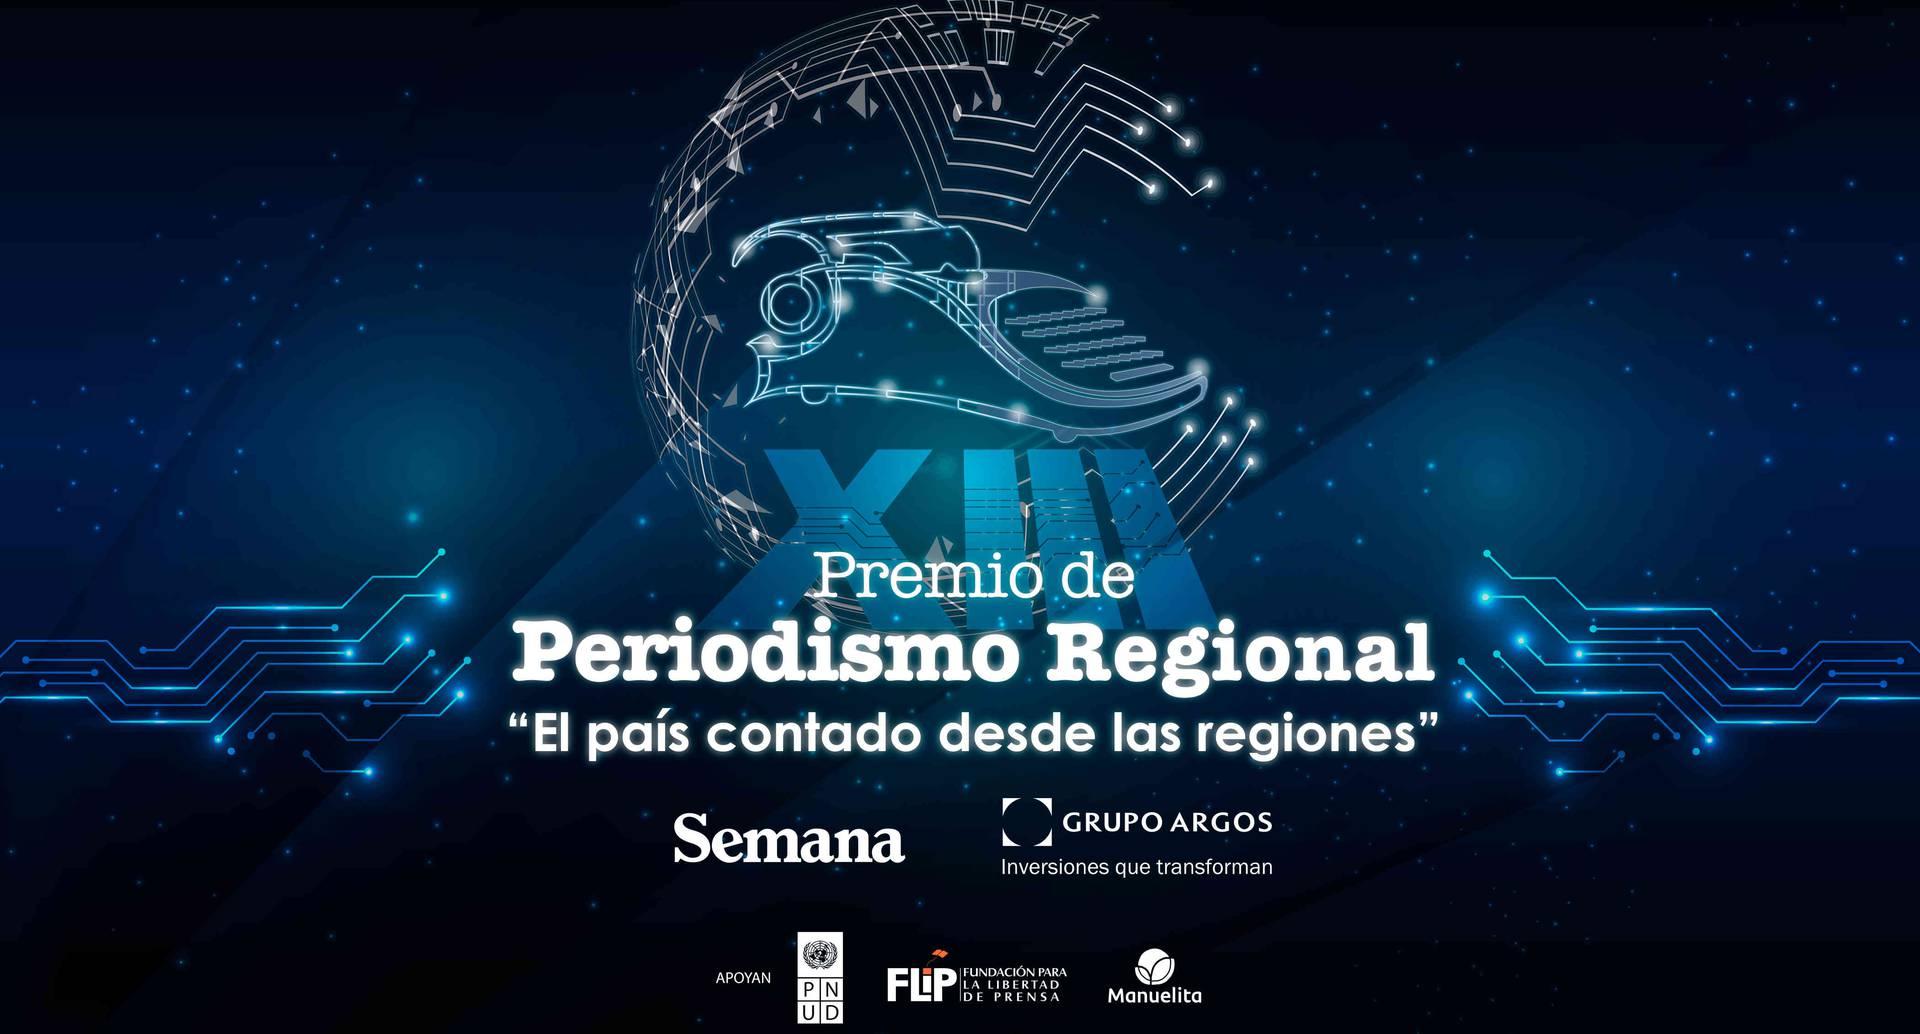 Ganadores Premio de Periodismo Regional Semana-Grupo Argos | Noticias Colombia hoy